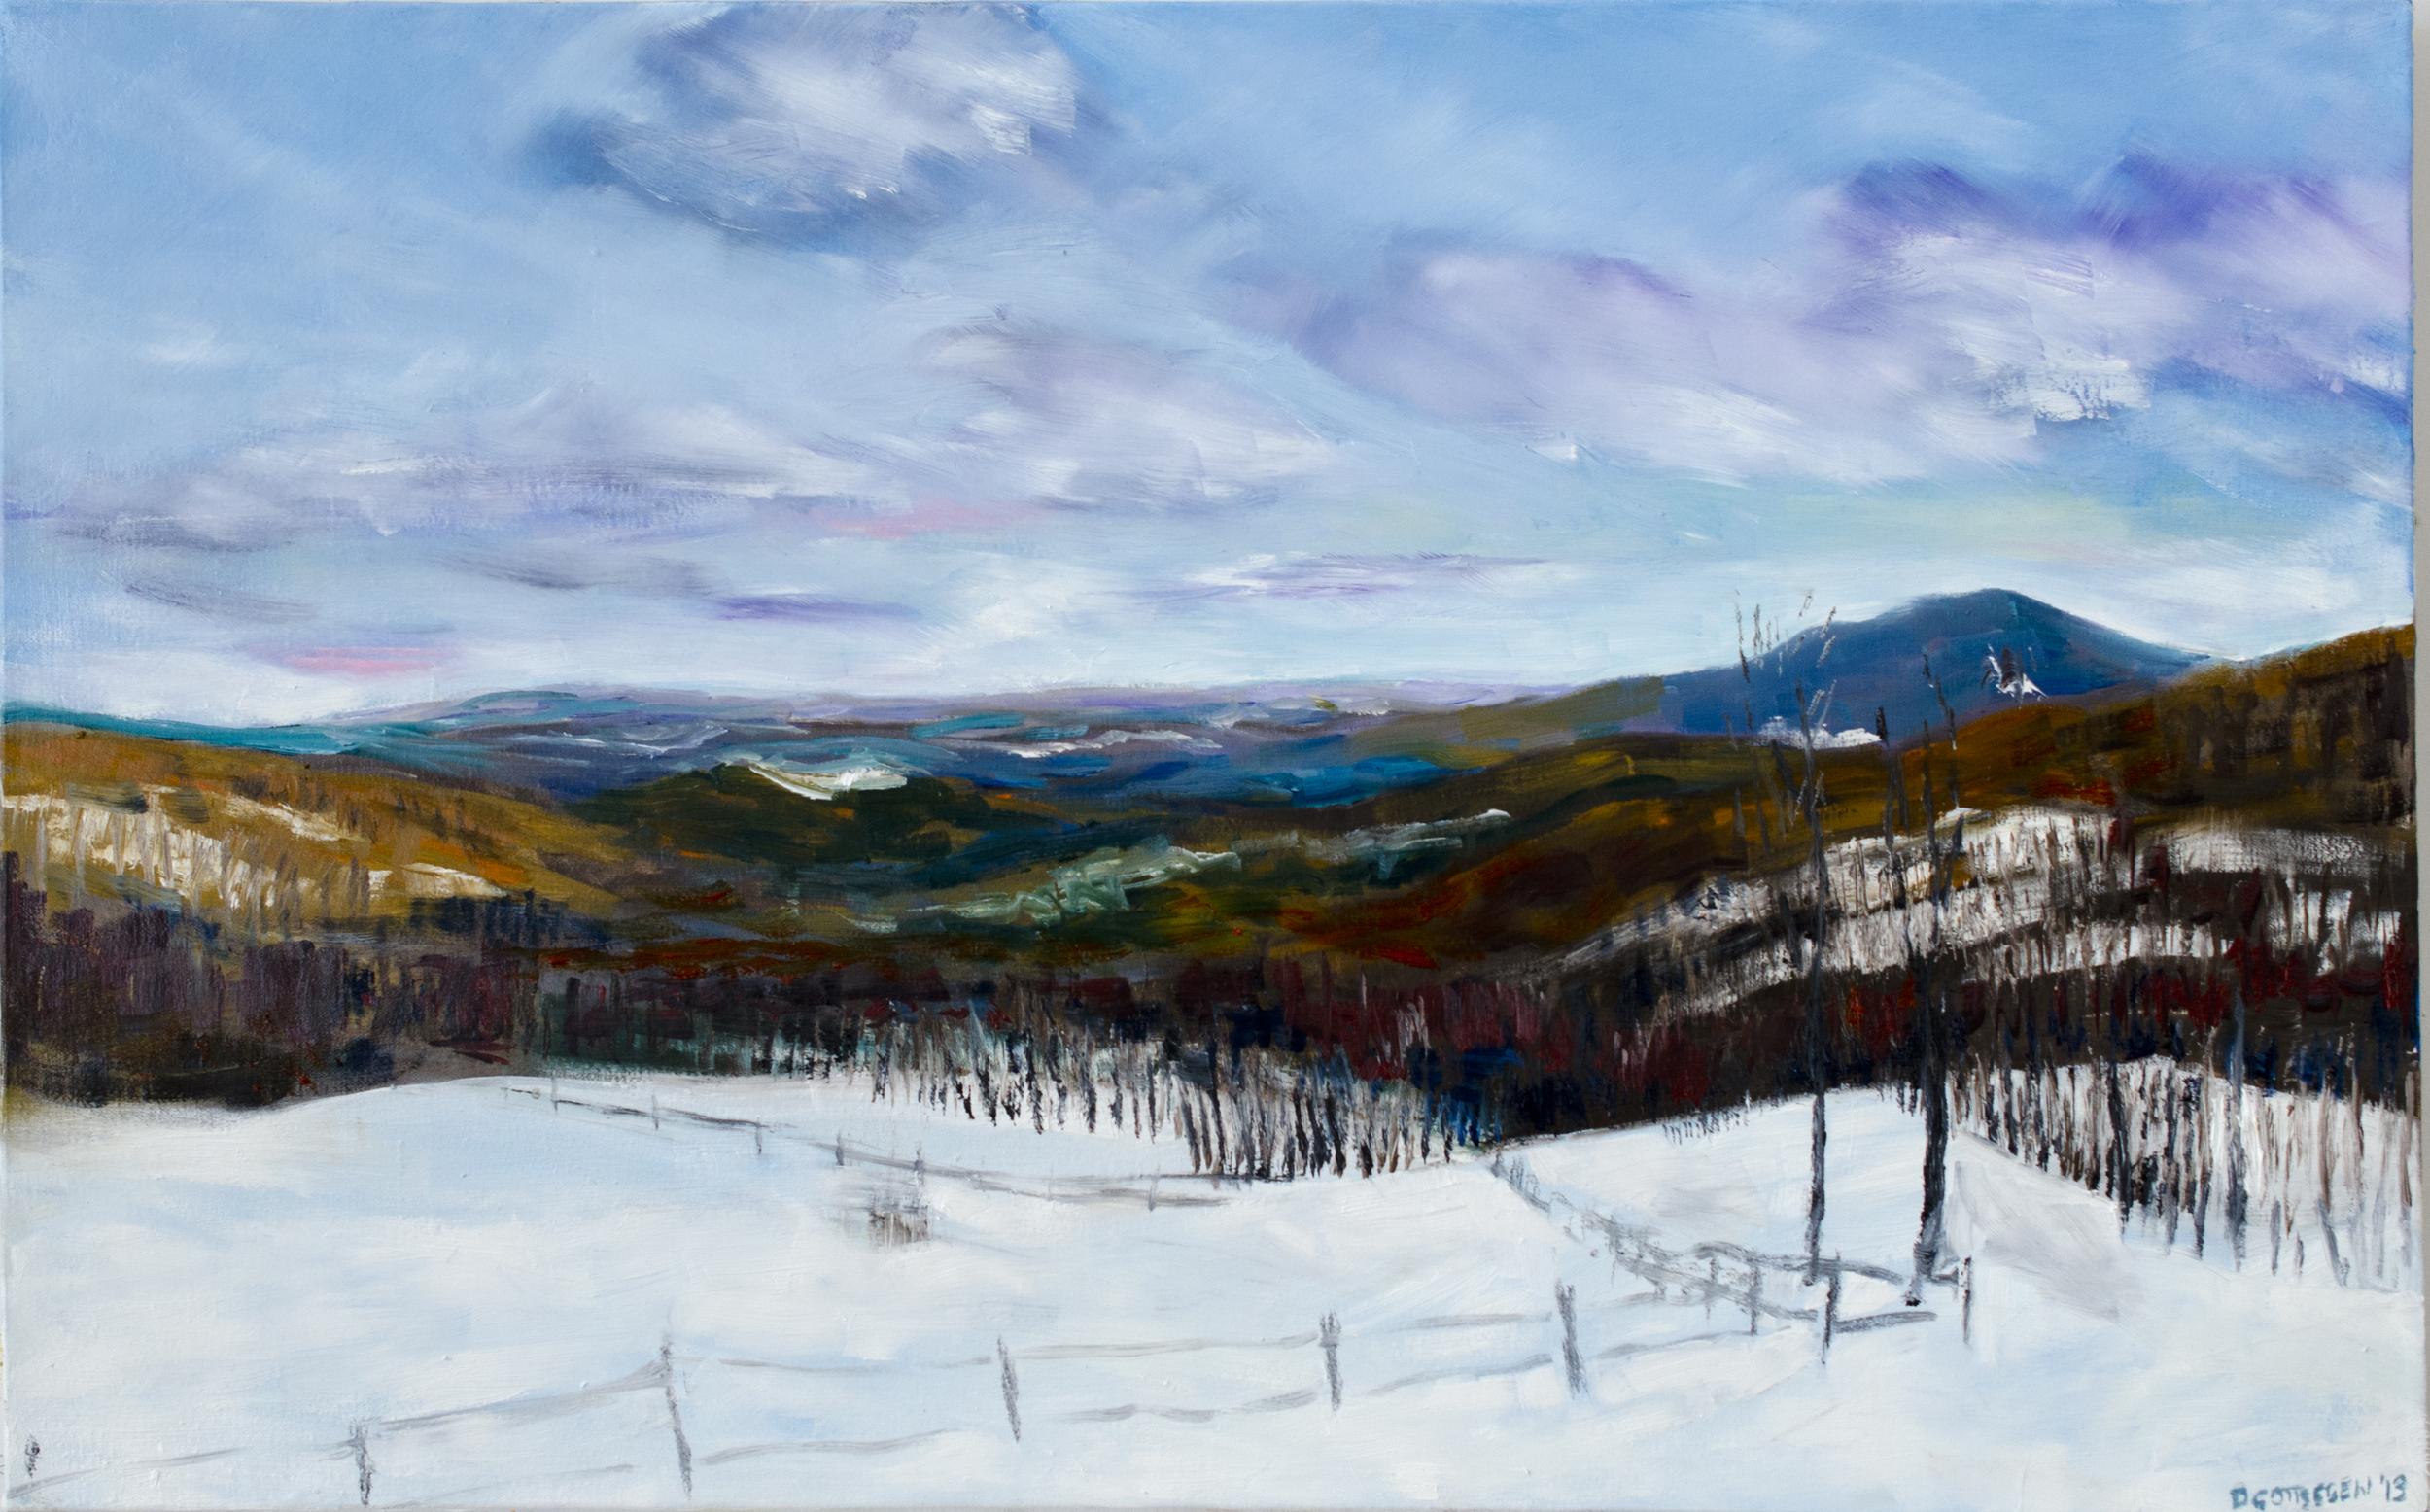 Studio Winter View